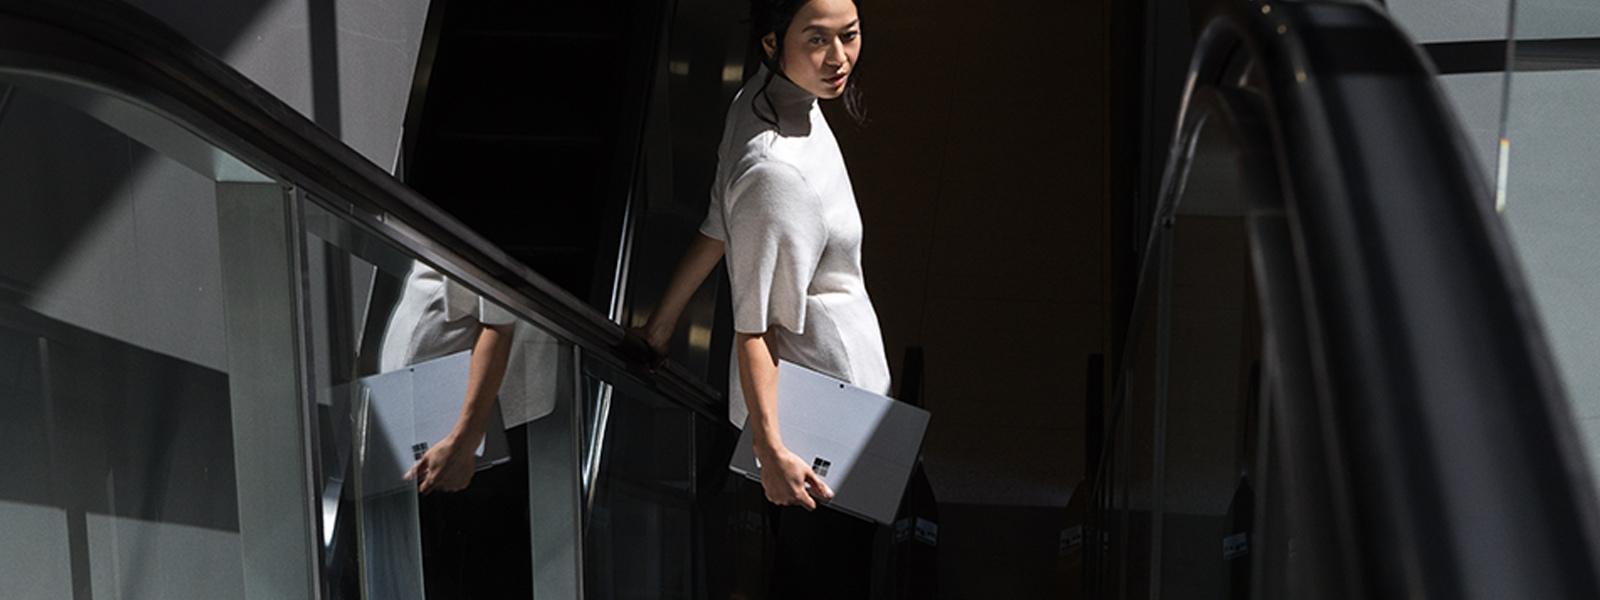 Surface Pro를 들고 있는 상태로 에스컬레이터를 내려오는 여성